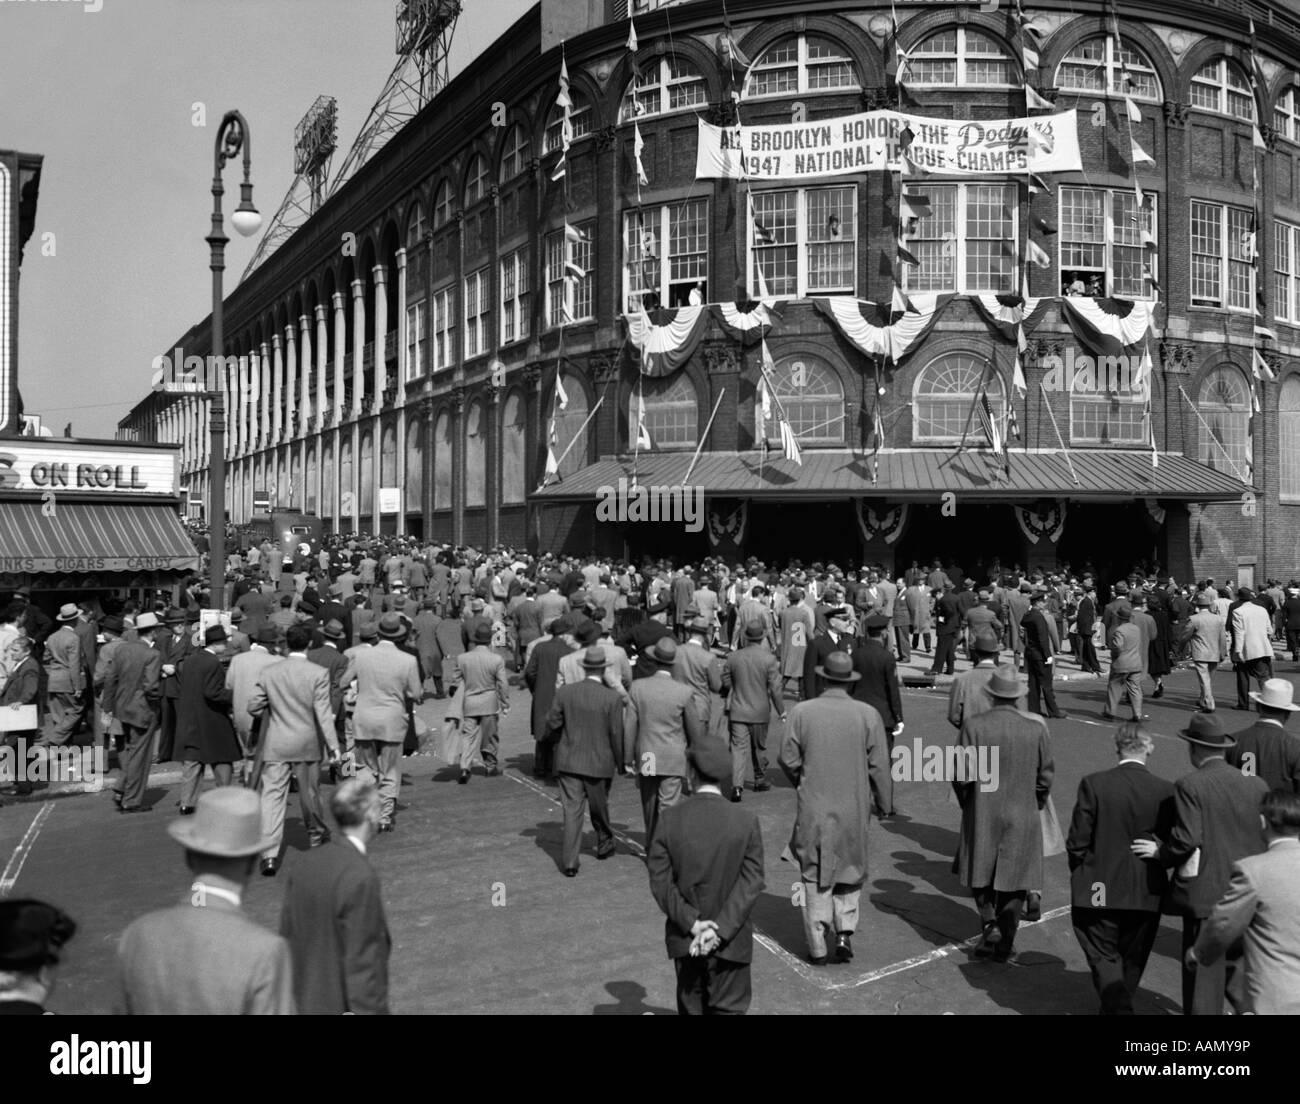 OCTOBER 1947 DODGER BASEBALL FANS POUR INTO MAIN ENTRANCE BROOKLYN BOROUGH EBBETS FIELD NEW YORK CITY USA - Stock Image